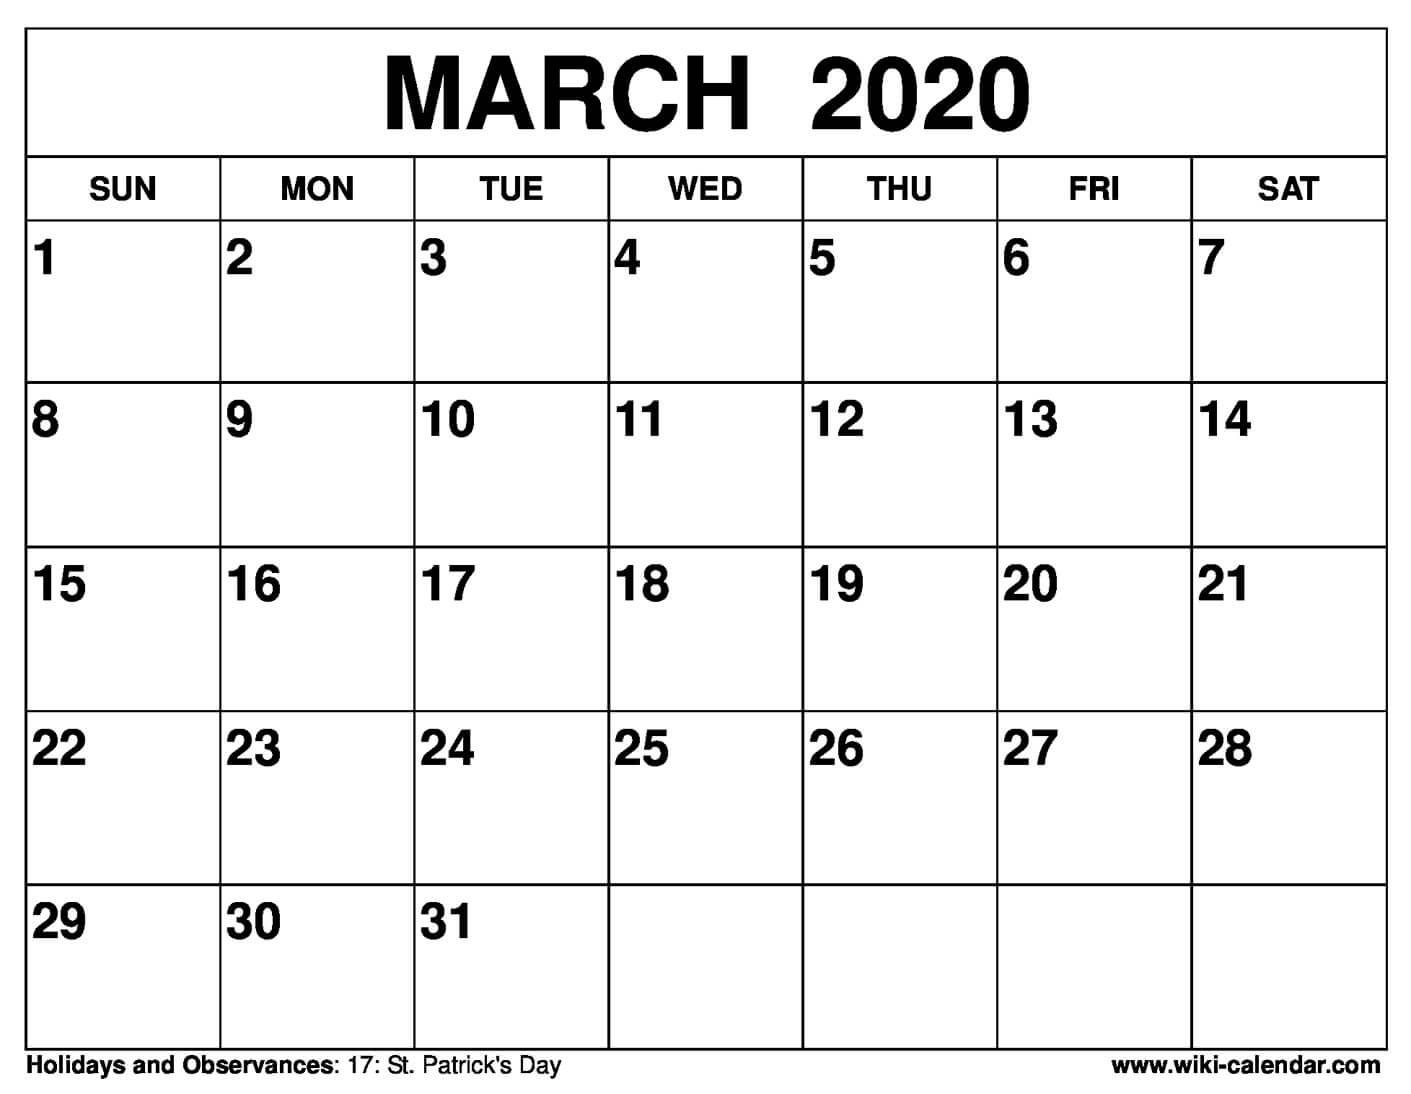 Free Printable March 2020 Calendars  Printable March 2020 Calendar Pdf